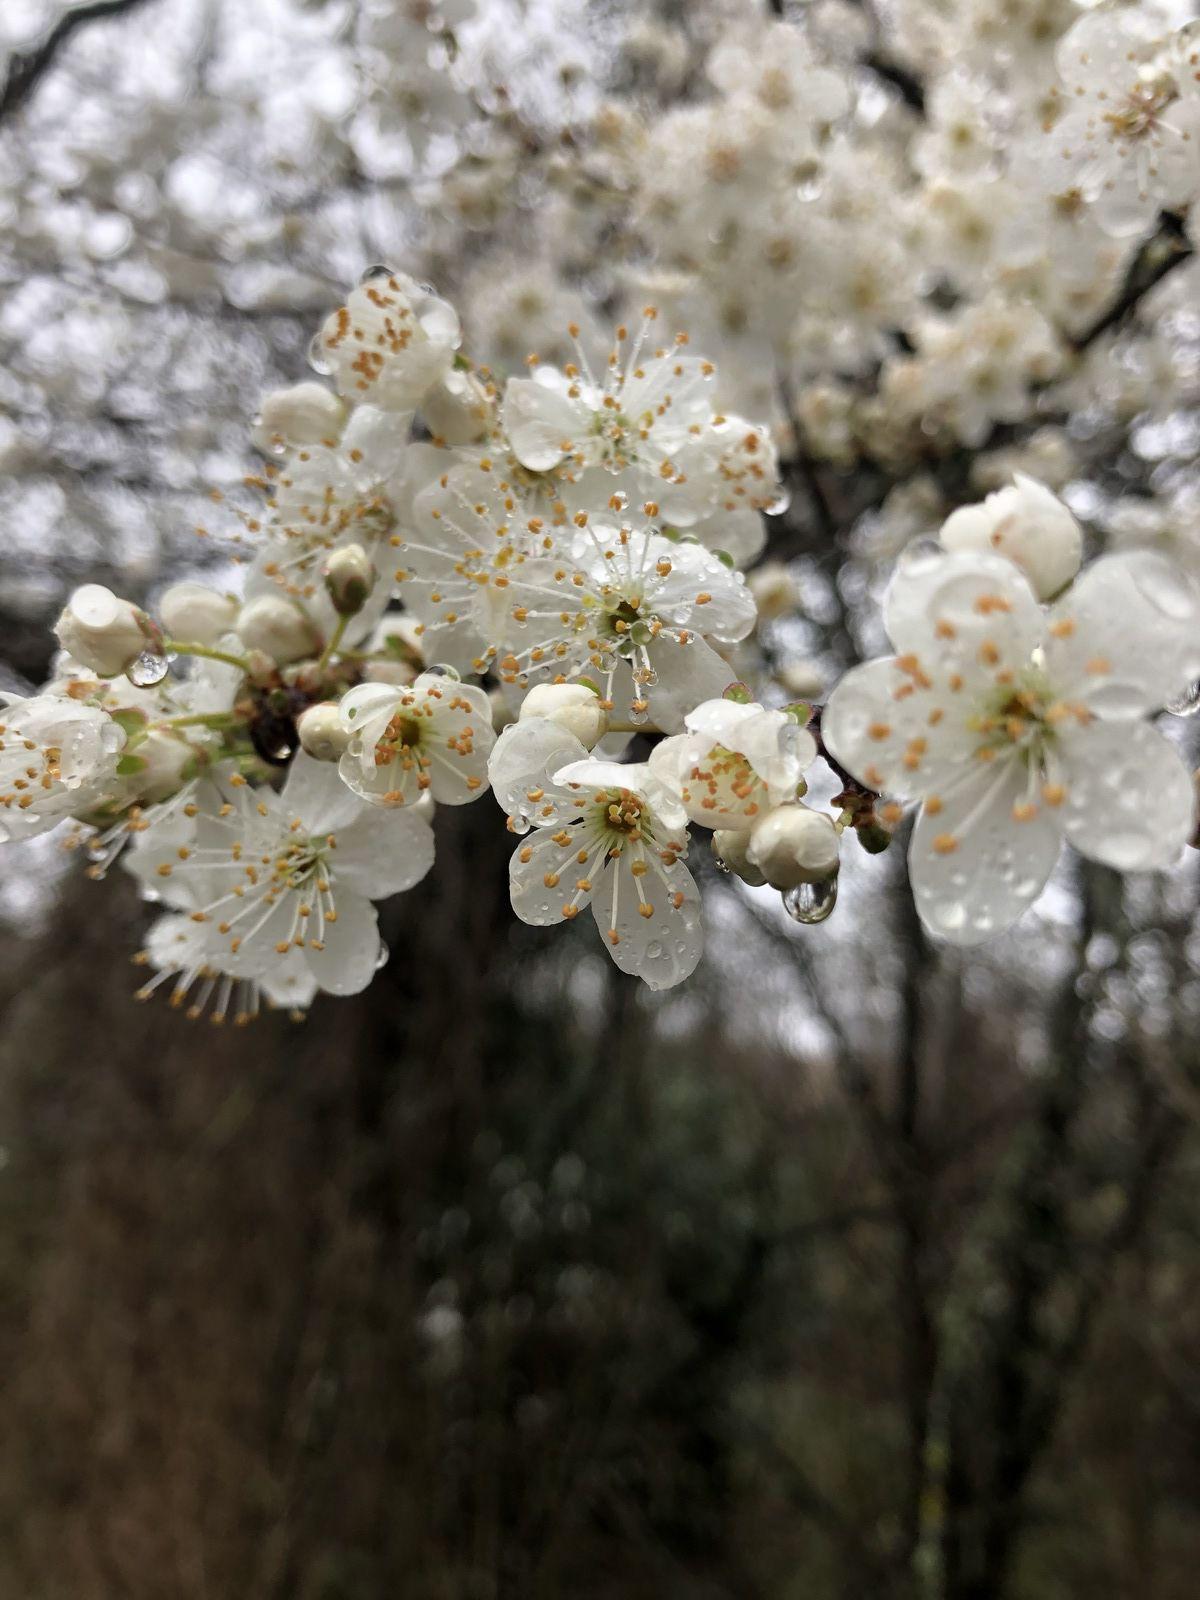 Inflorescence de Prunus spinosa famille des Rosaceae.